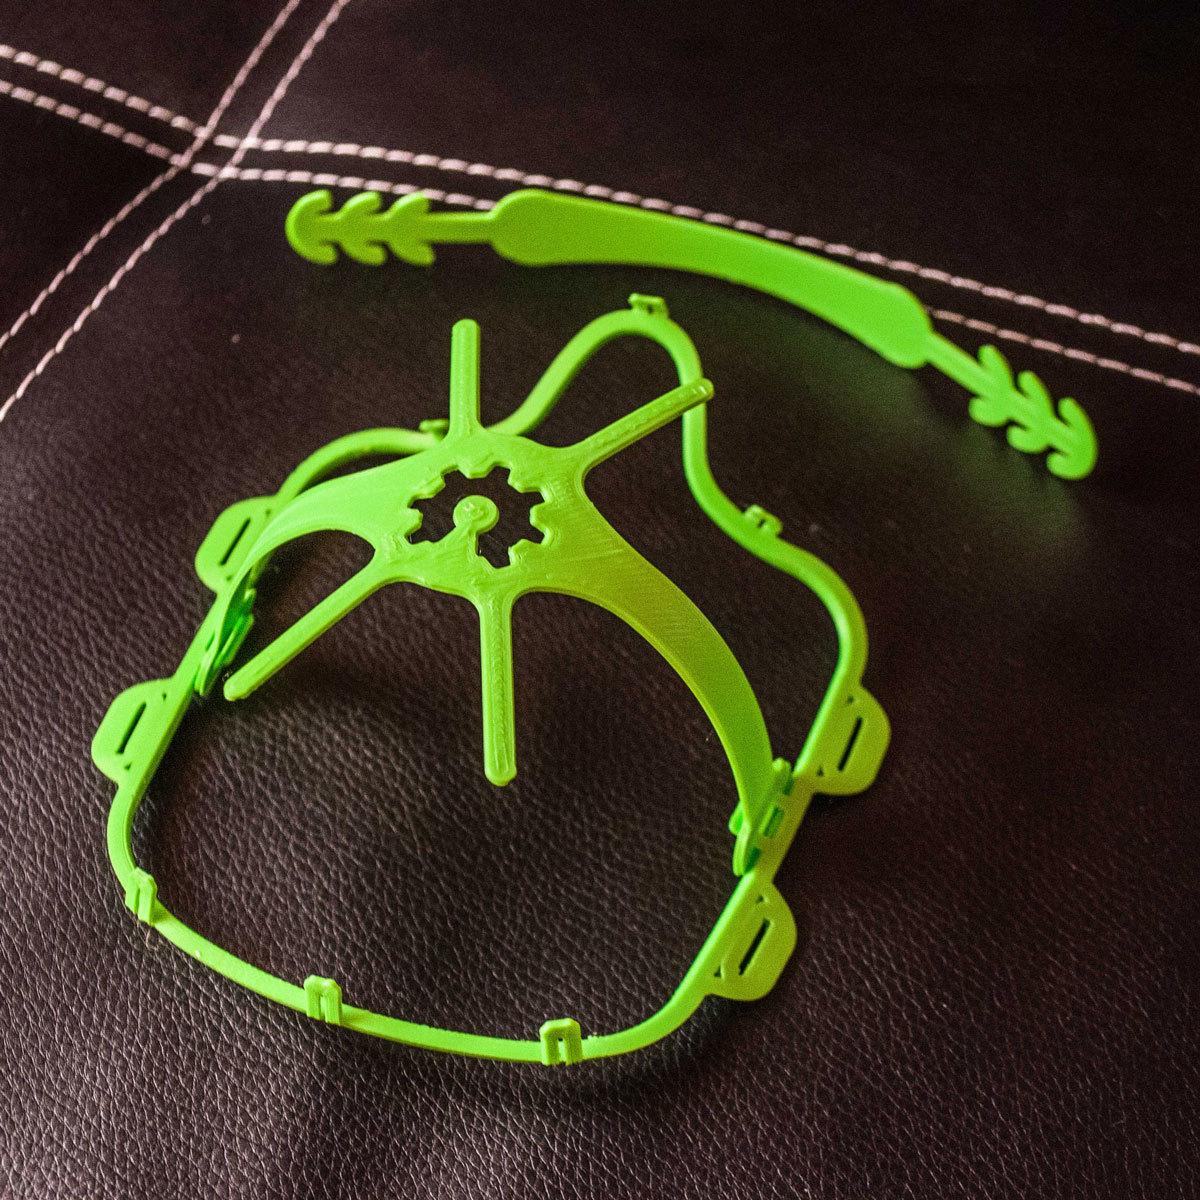 4.jpg Download free STL file Hermetic Mask • 3D print design, Checho3d